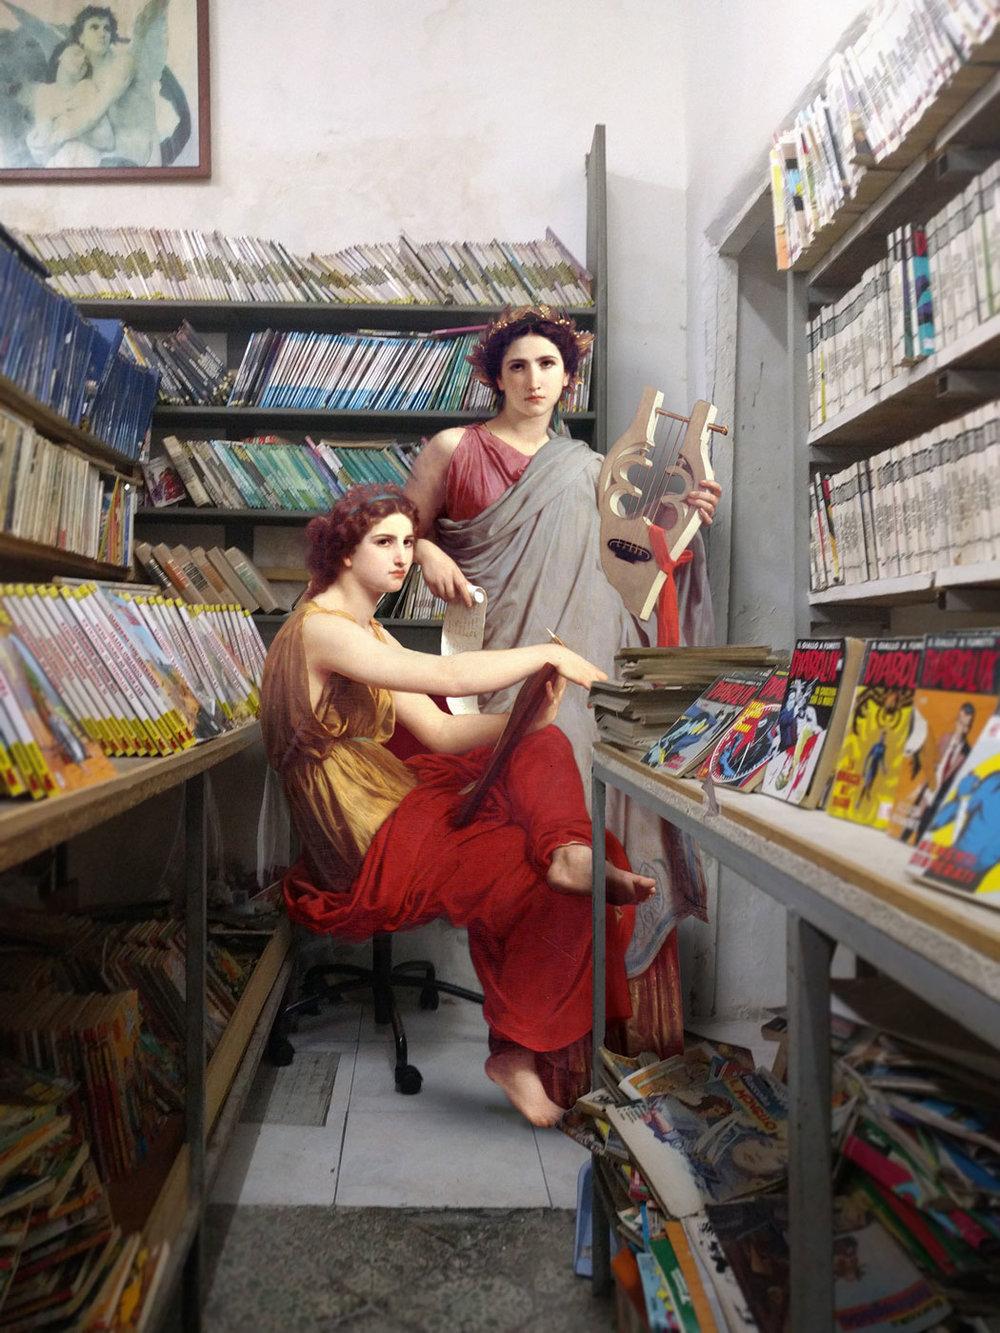 personaggi-dipinti-rinascimento-invadono-strade-napoli-fotomontaggi-alexey-kondakov-08